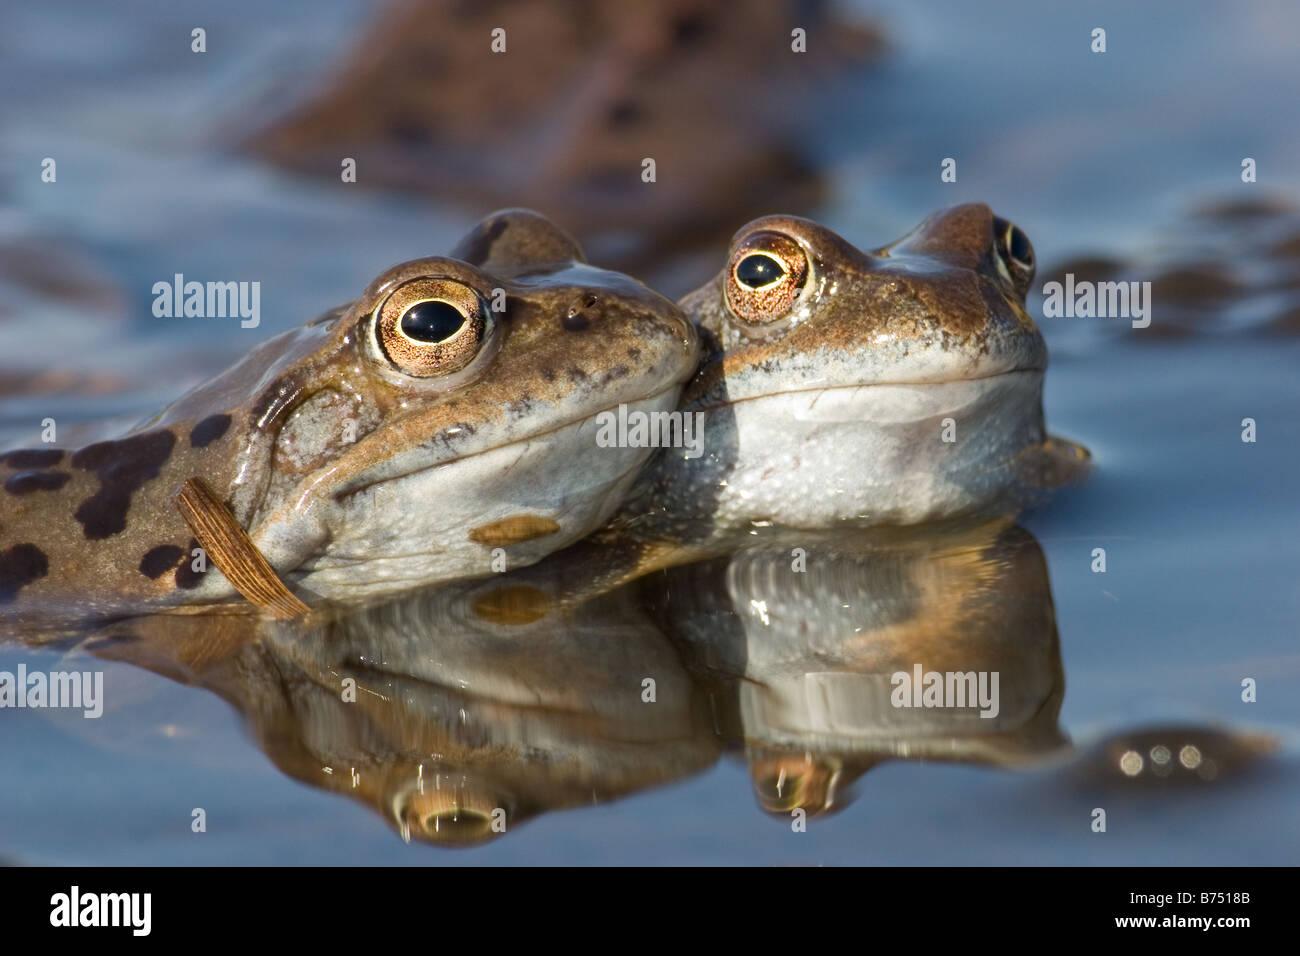 Common Frogs, Rana temporaria pair enjoying matings - Stock Image